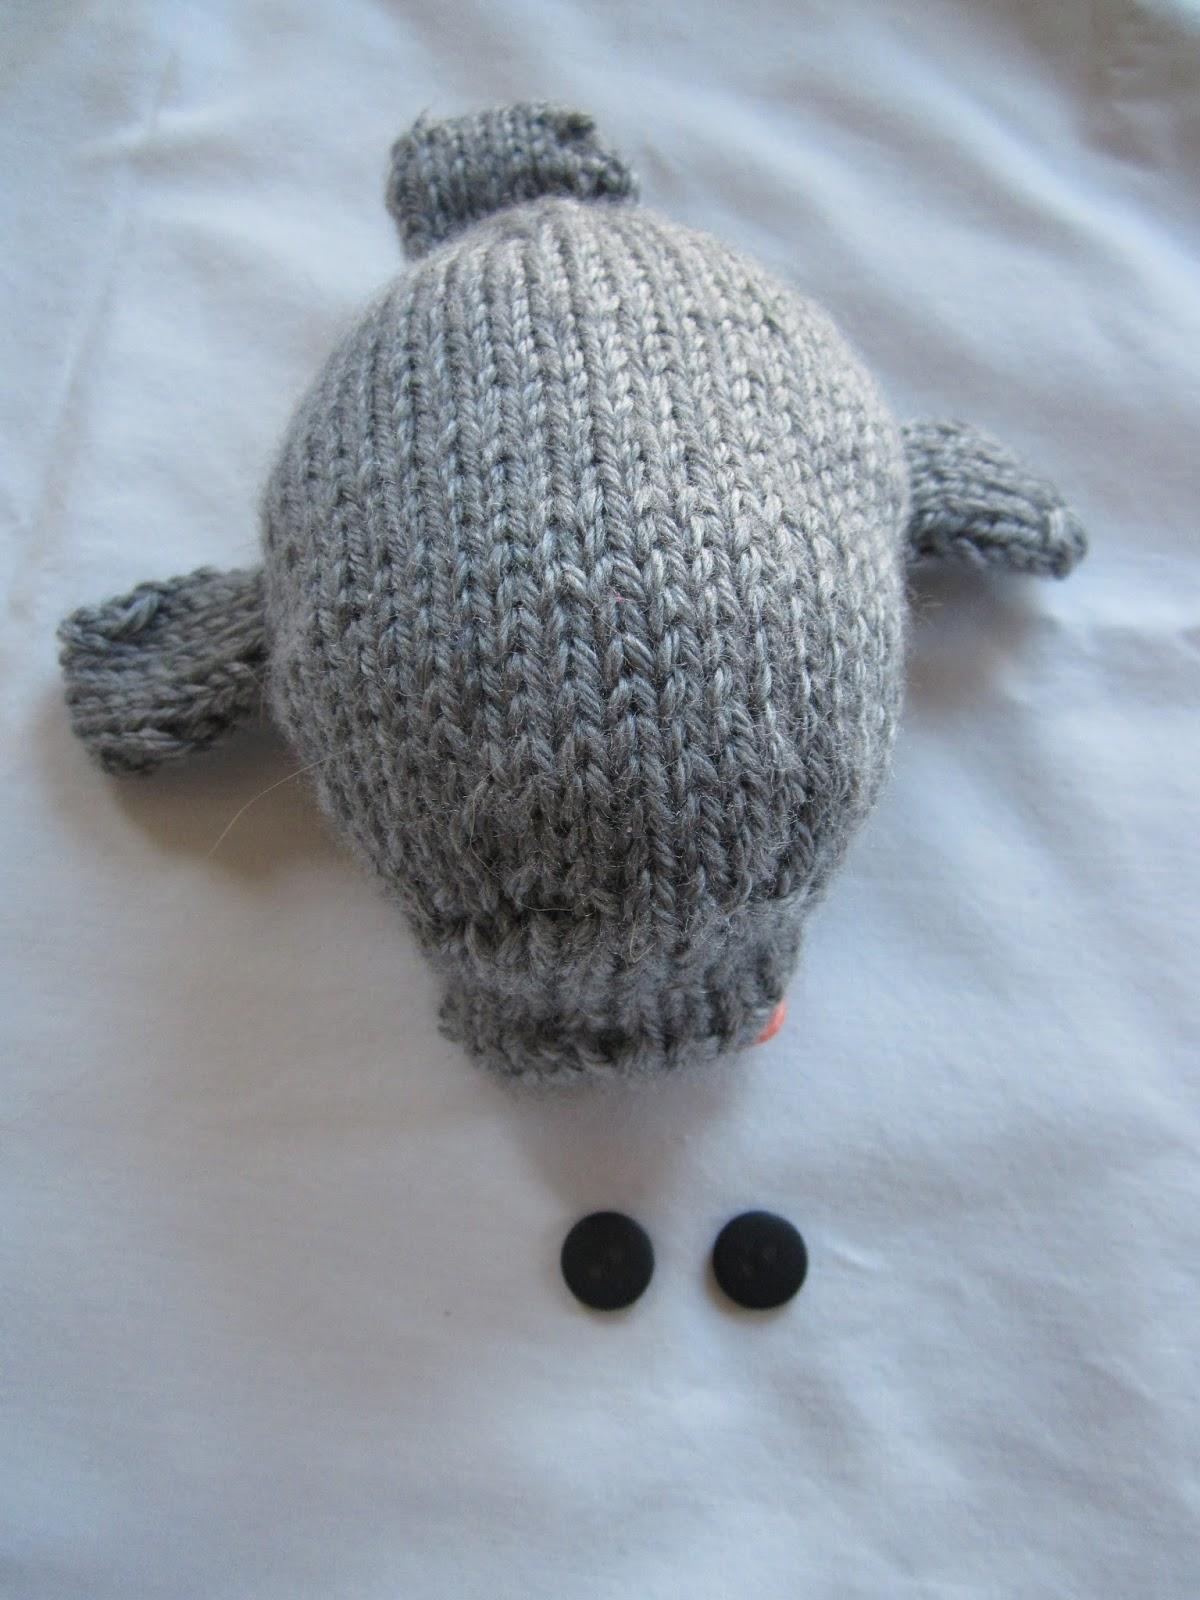 knit read cats hockey: More Secret Knitting Revealed!